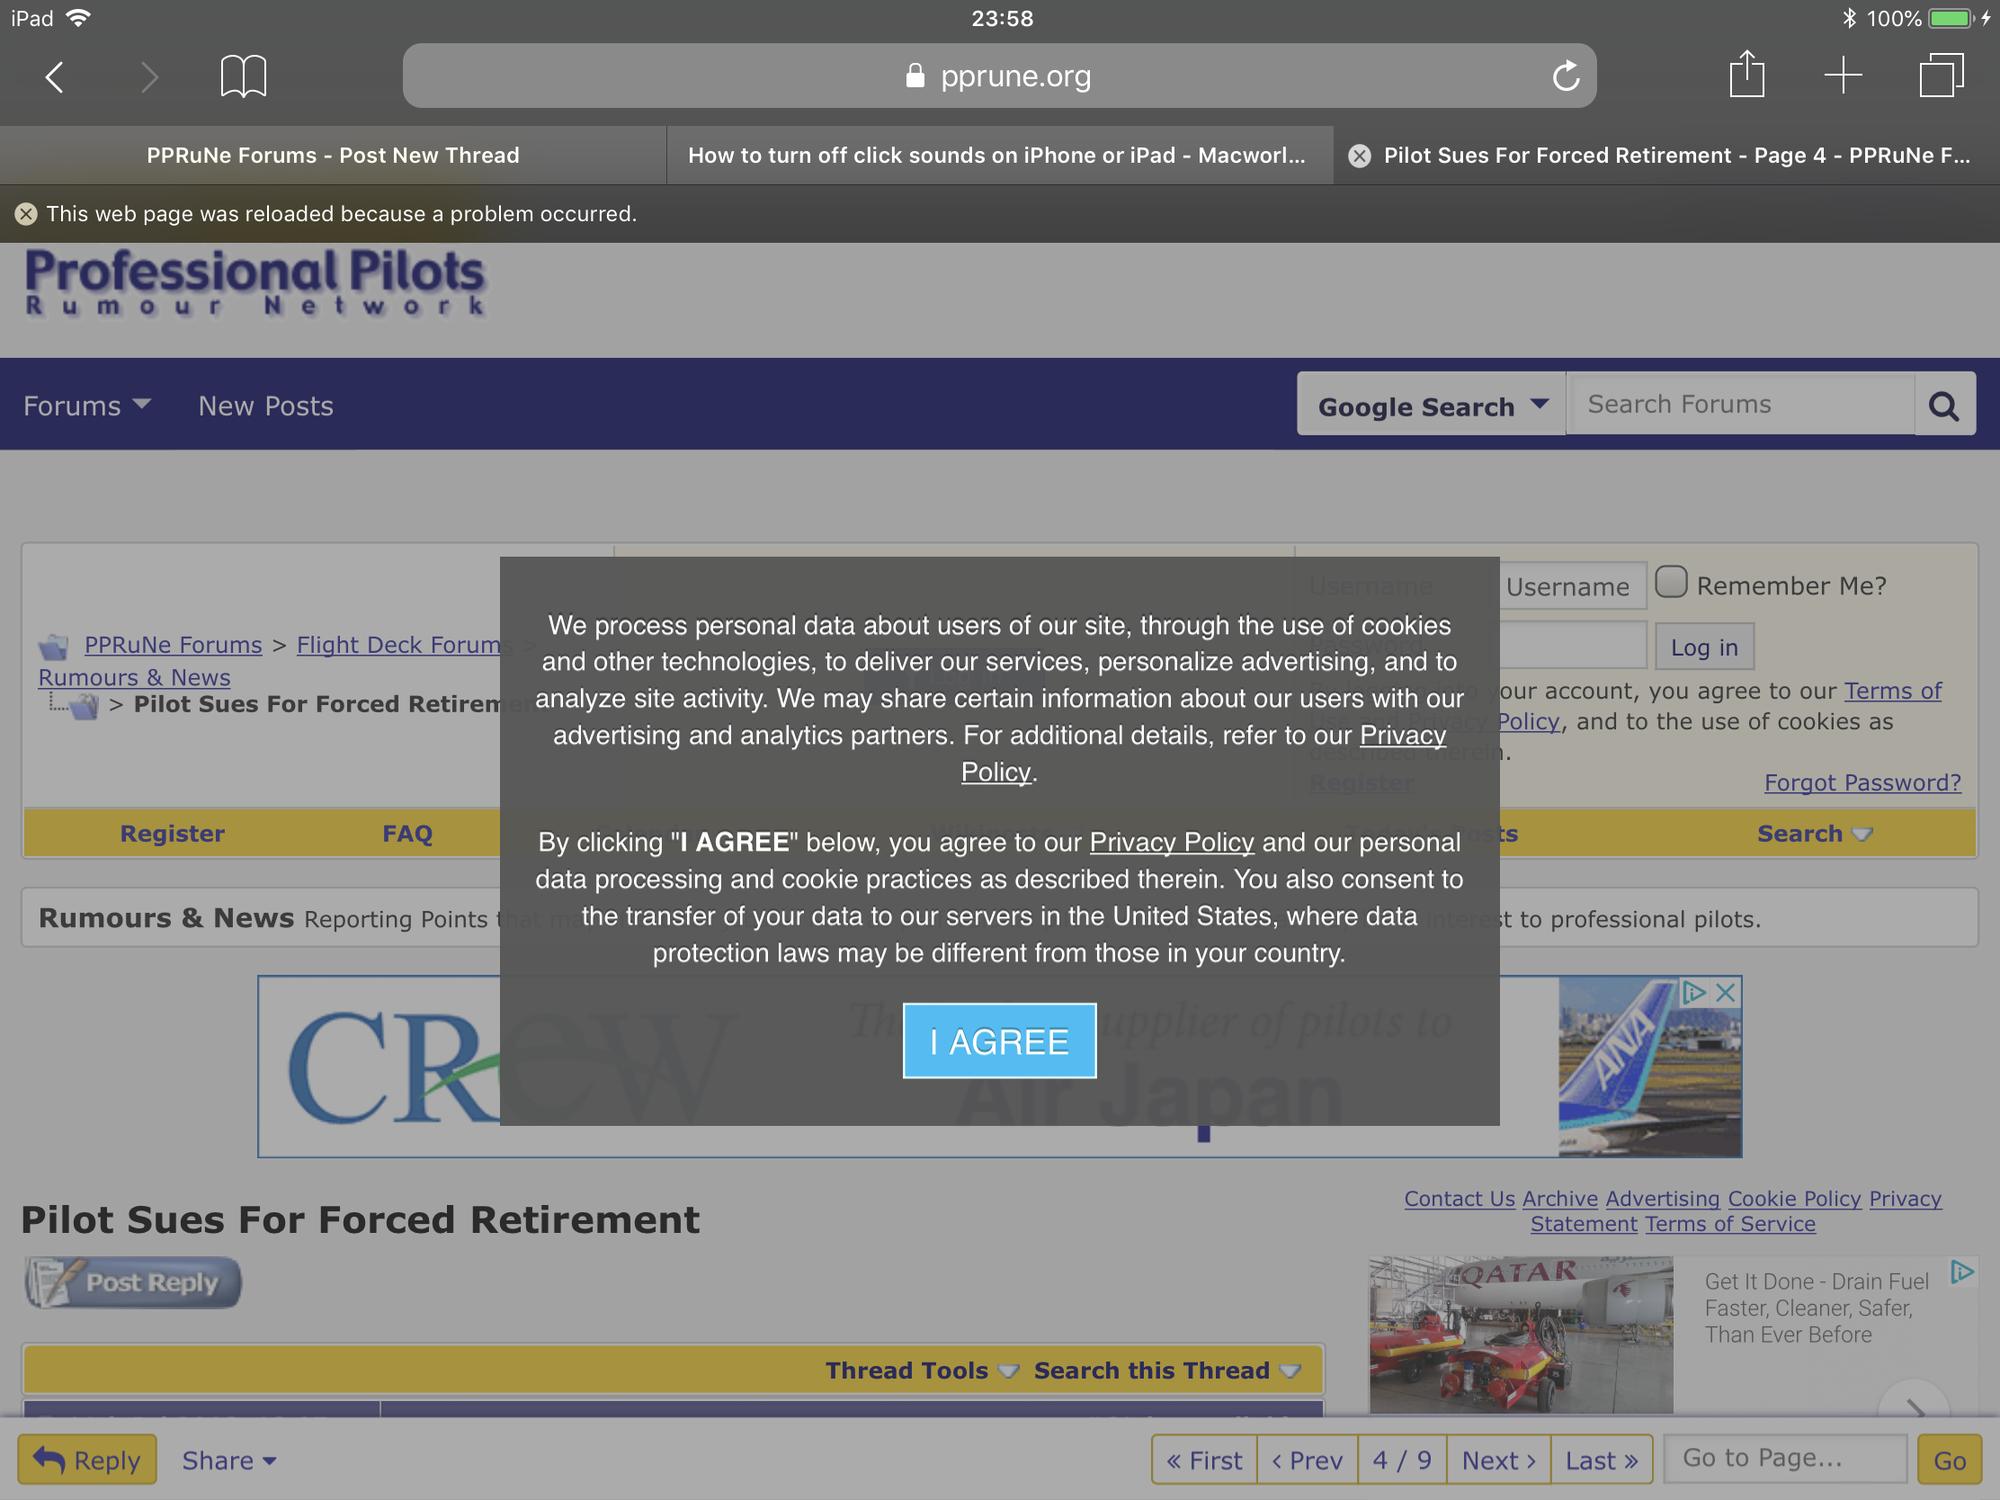 Pprune crashes Safari on iPad - PPRuNe Forums